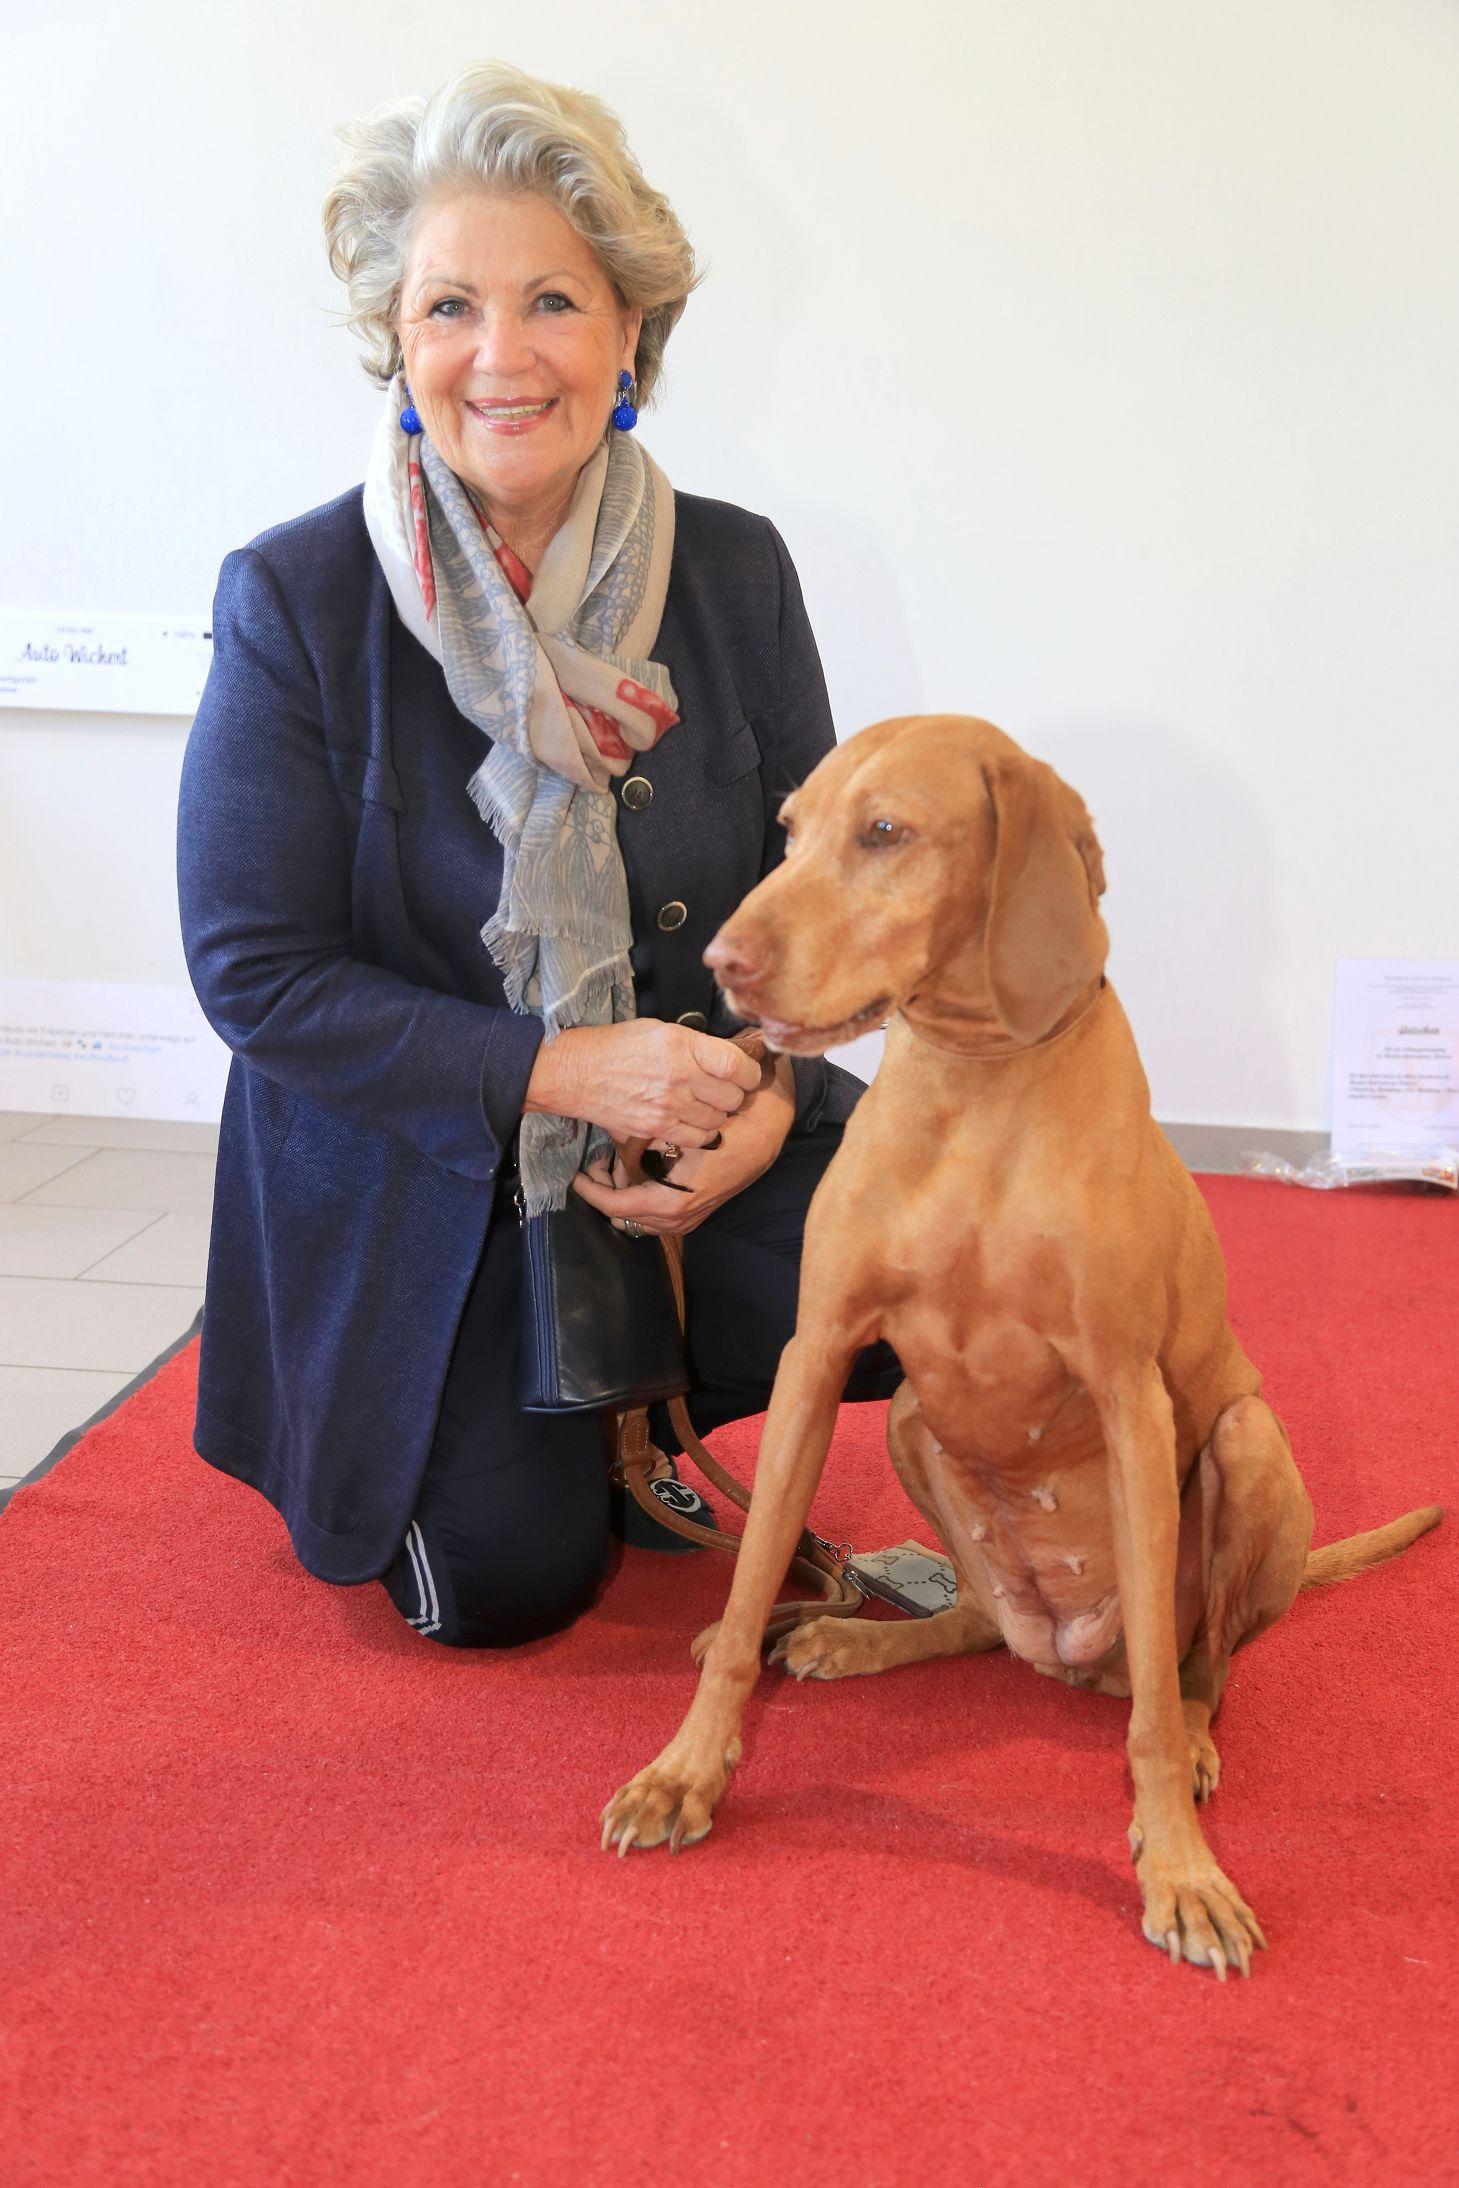 Charitylady Hannelore Lay mit Vizsla-Hündin Emmy auf der Hamburger Hundemesse